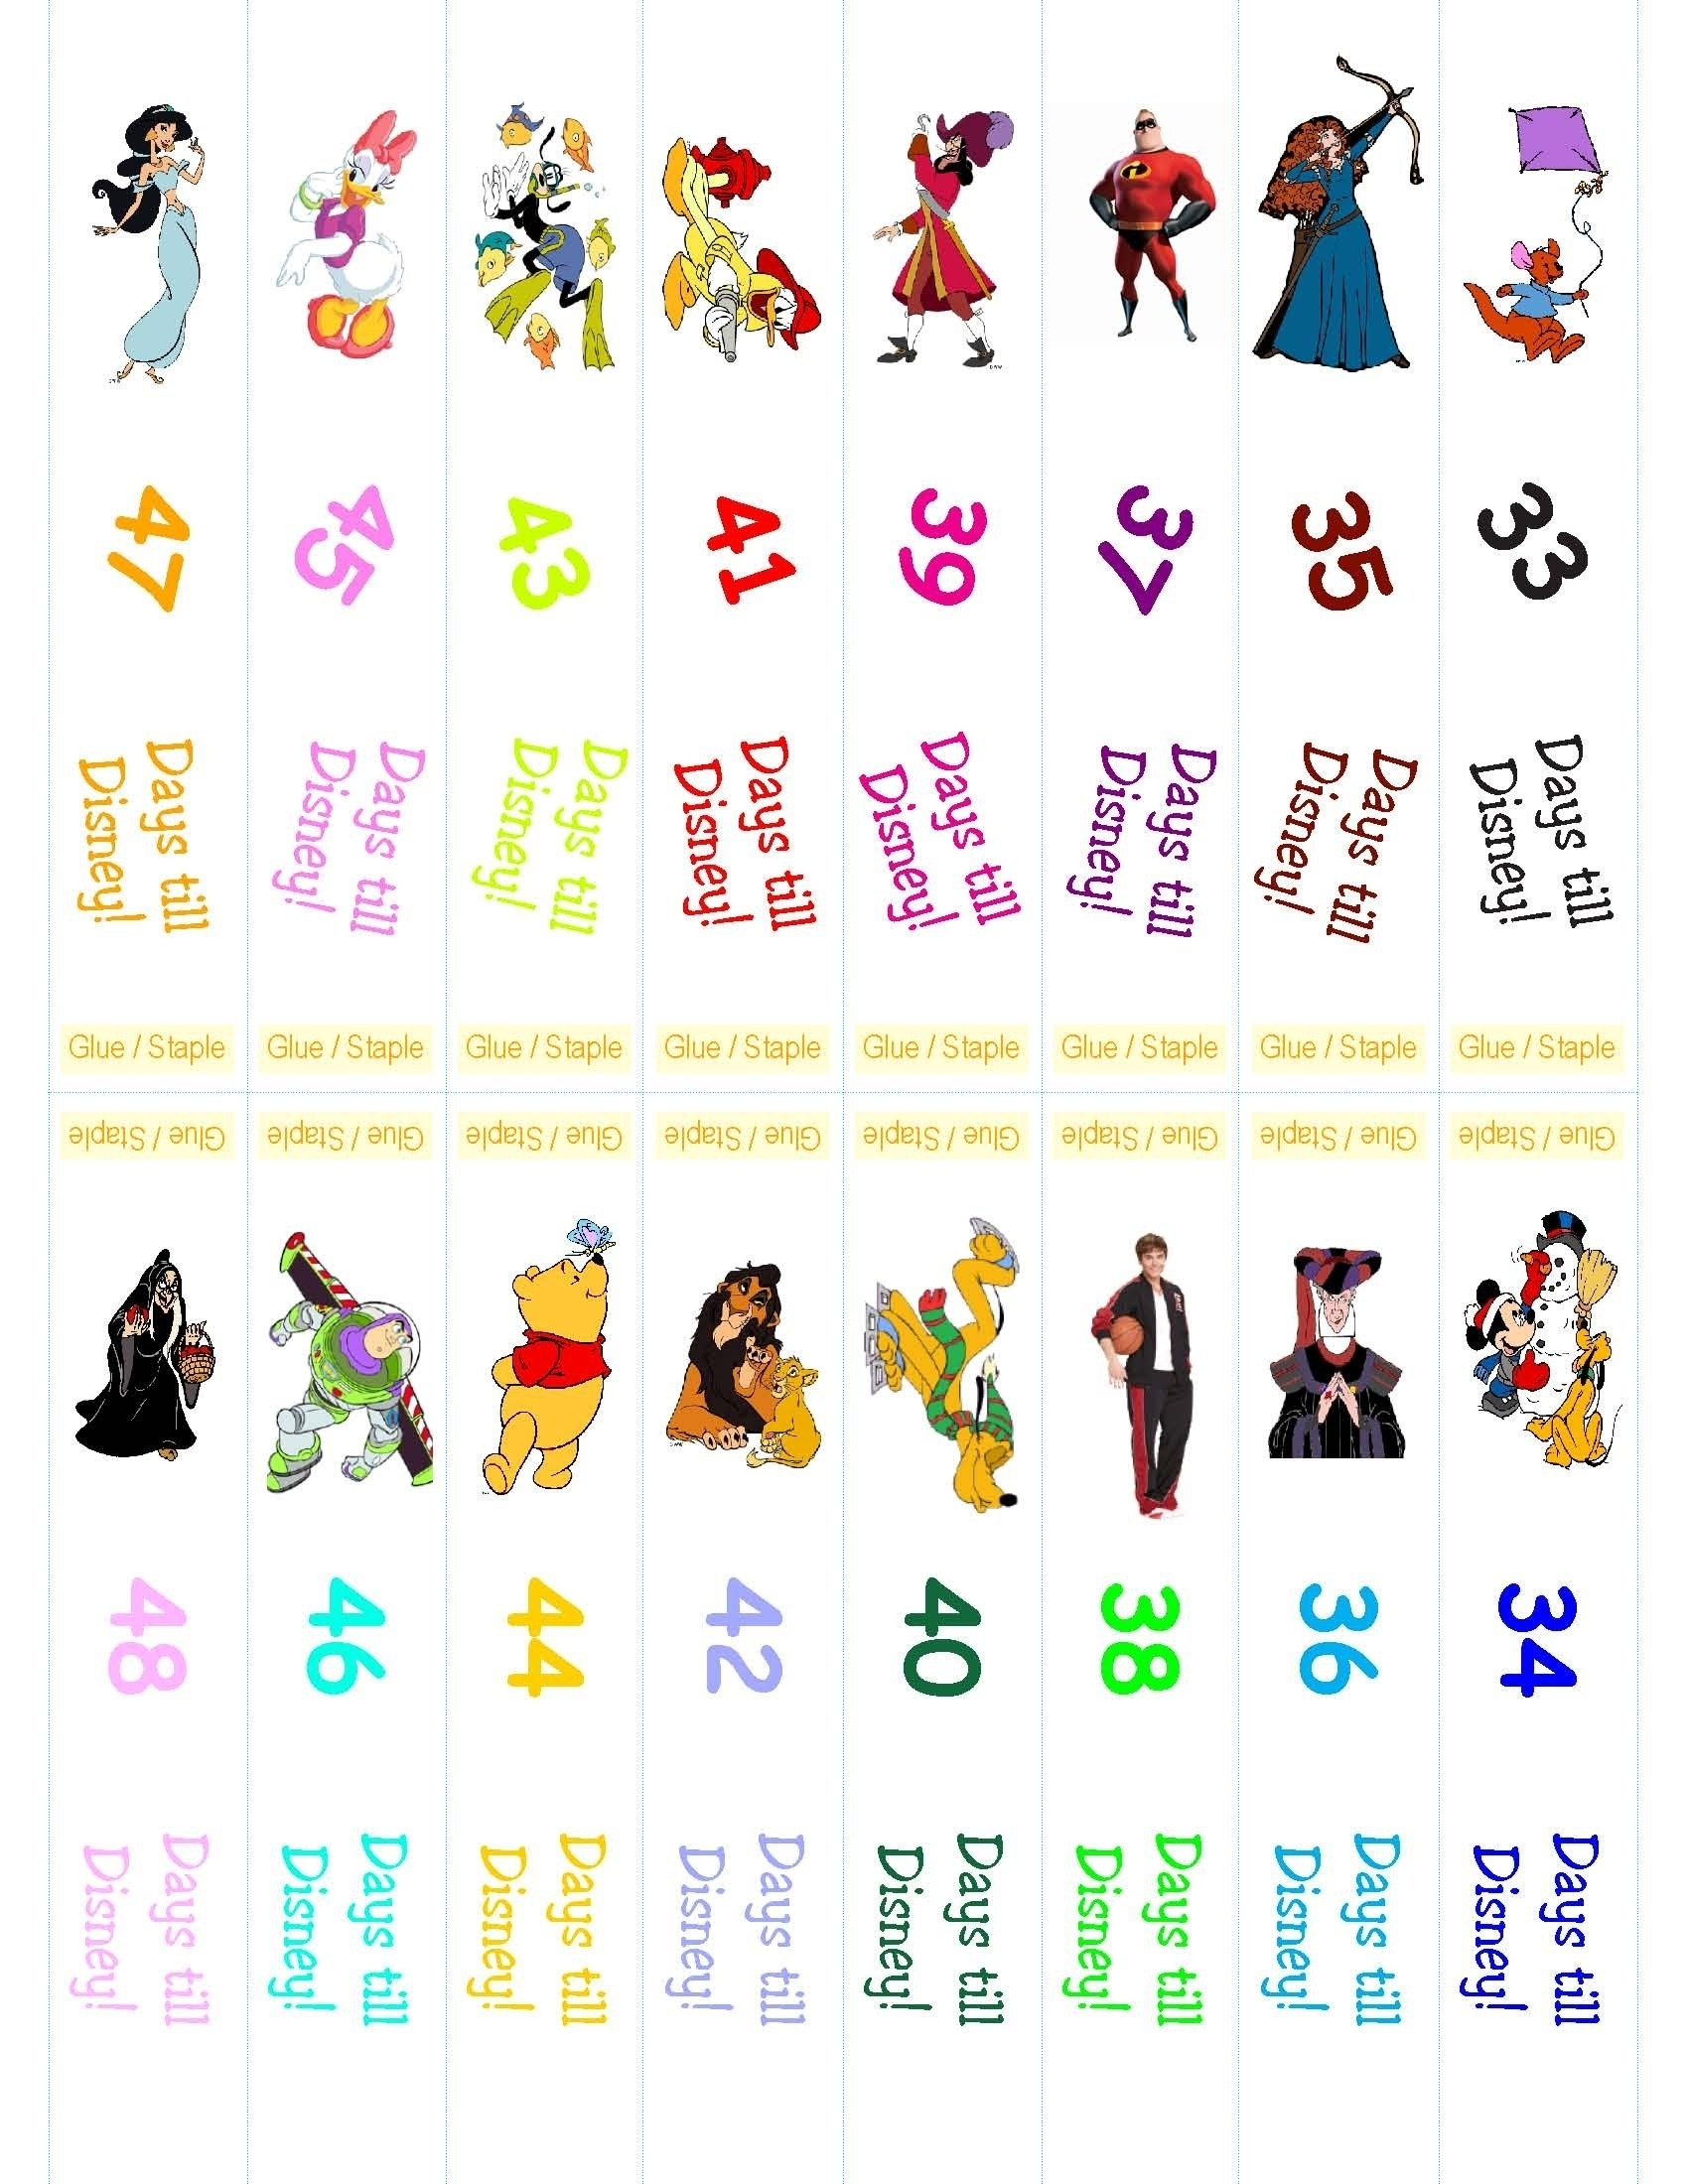 Disney Countdown Ring  99 Days To Disney Printable Calendar